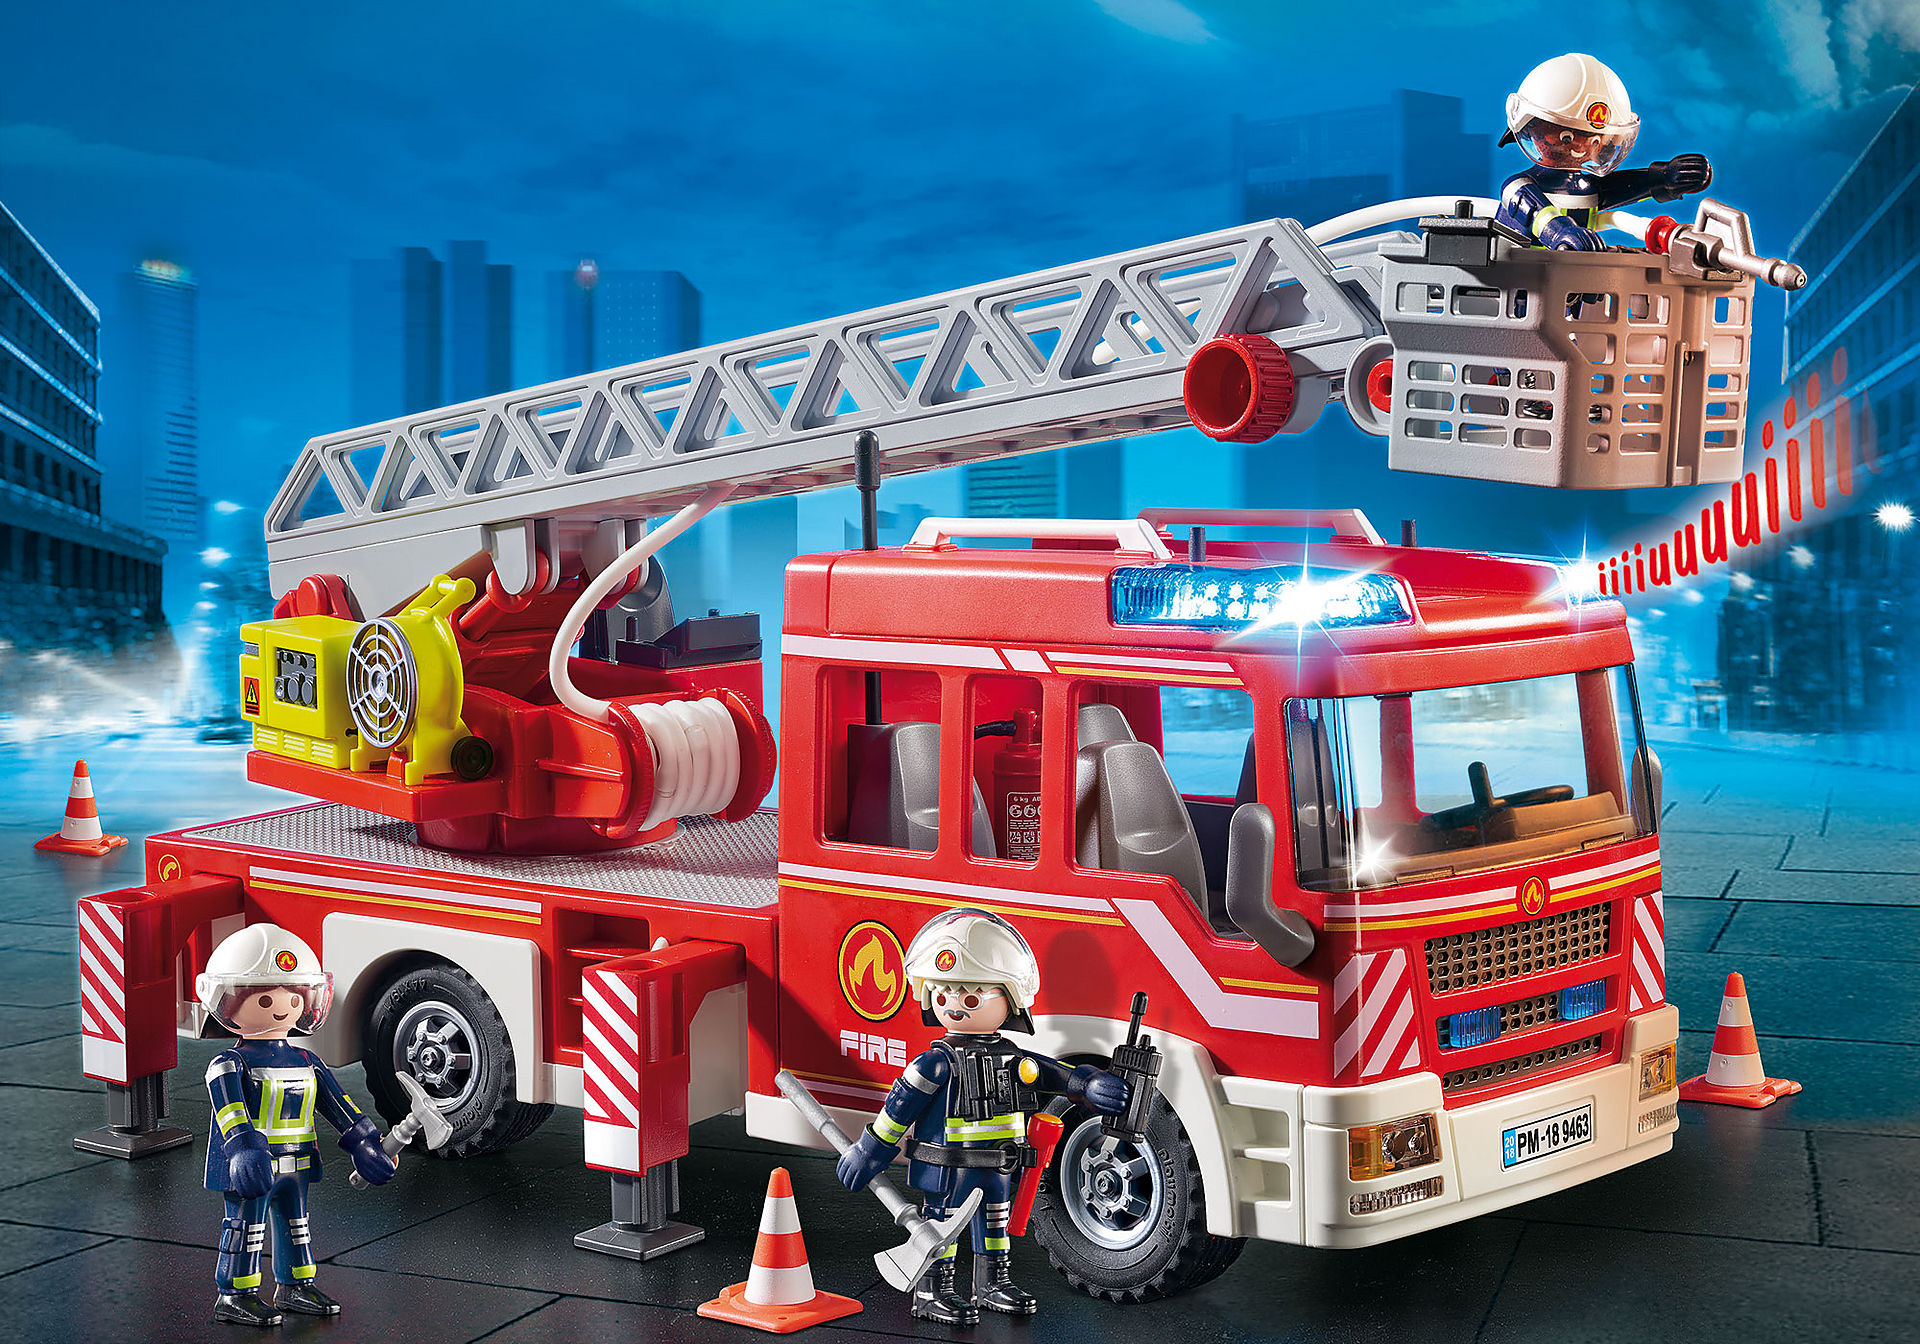 9463 Samochód strażacki z drabiną zoom image1